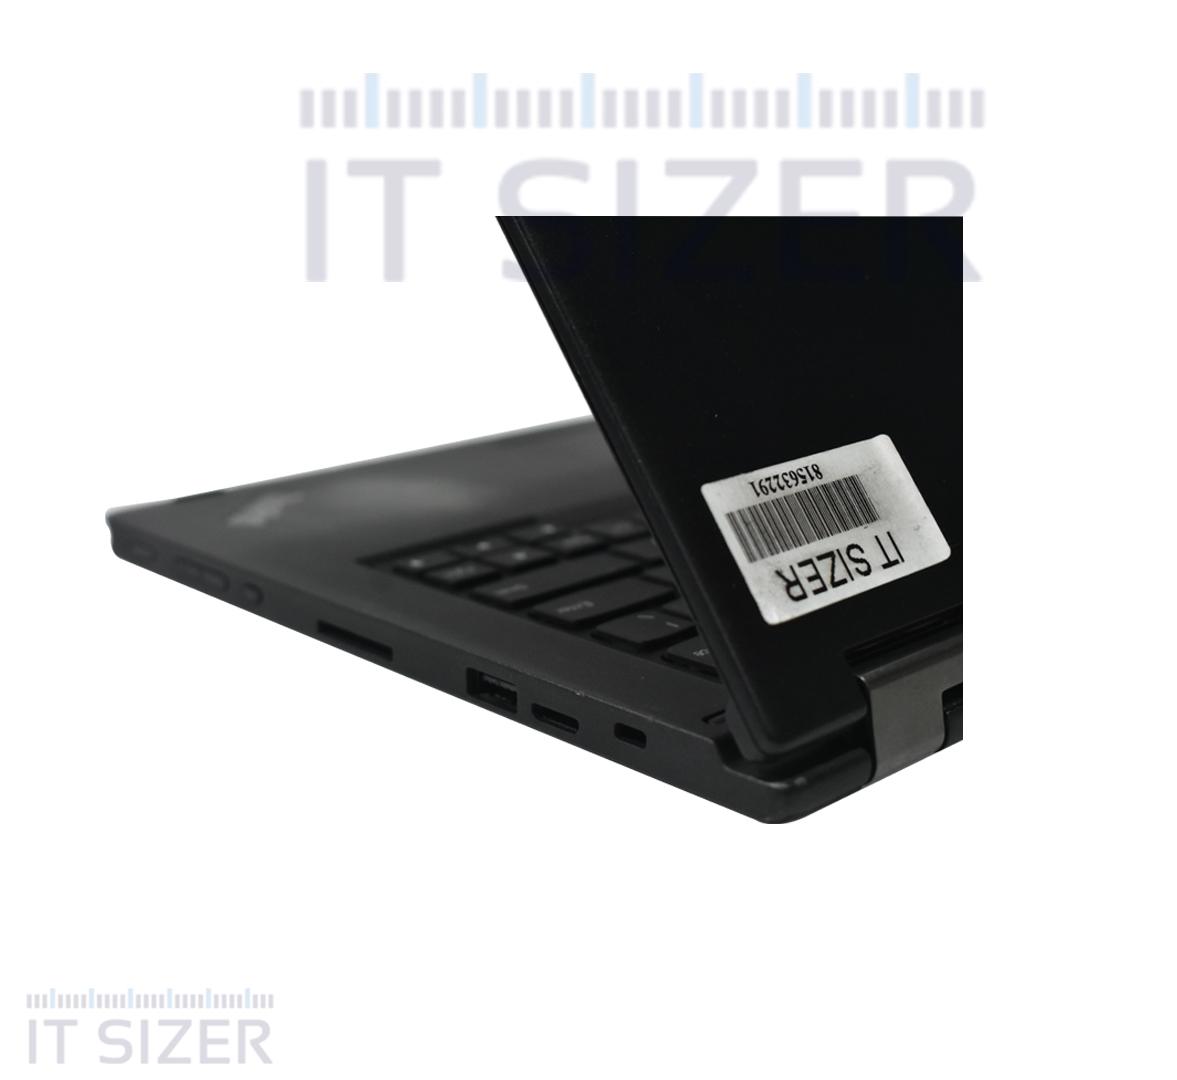 Lenovo Thinkpad yoga 12 Business Laptop, Intel Core i5-VPRO CPU, 8GB DDR3 BUILTIN RAM, 256GB SSD 2.5, 12 inch Touch 360 Display, Windows 10 Pro (Renewed)